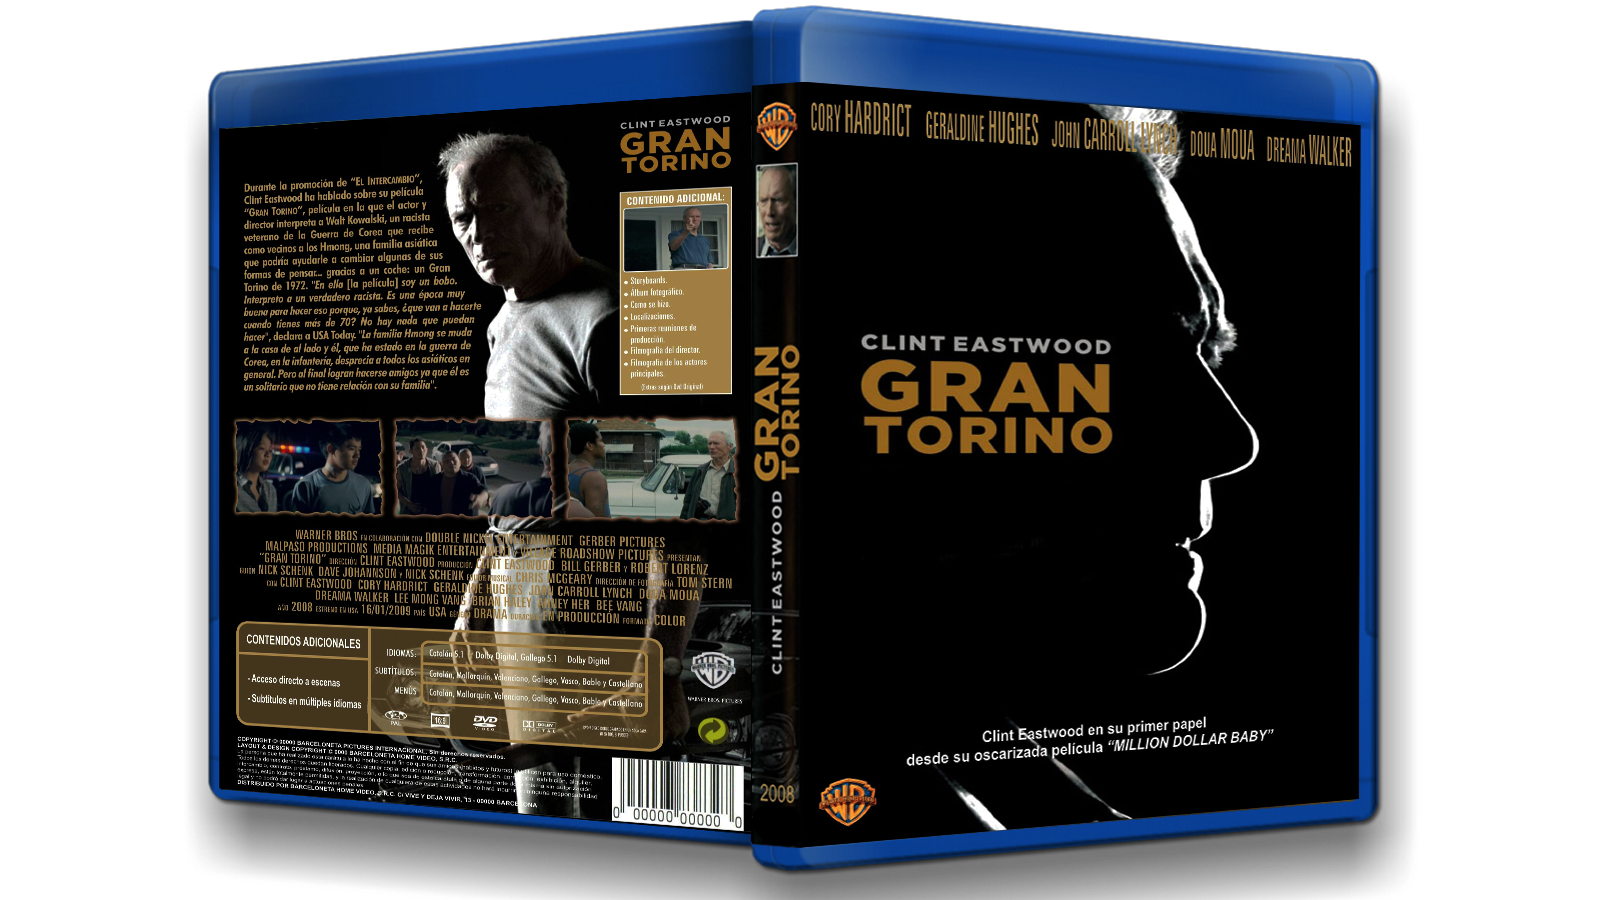 Gran Torino (2008) l Dual Audio l 720p